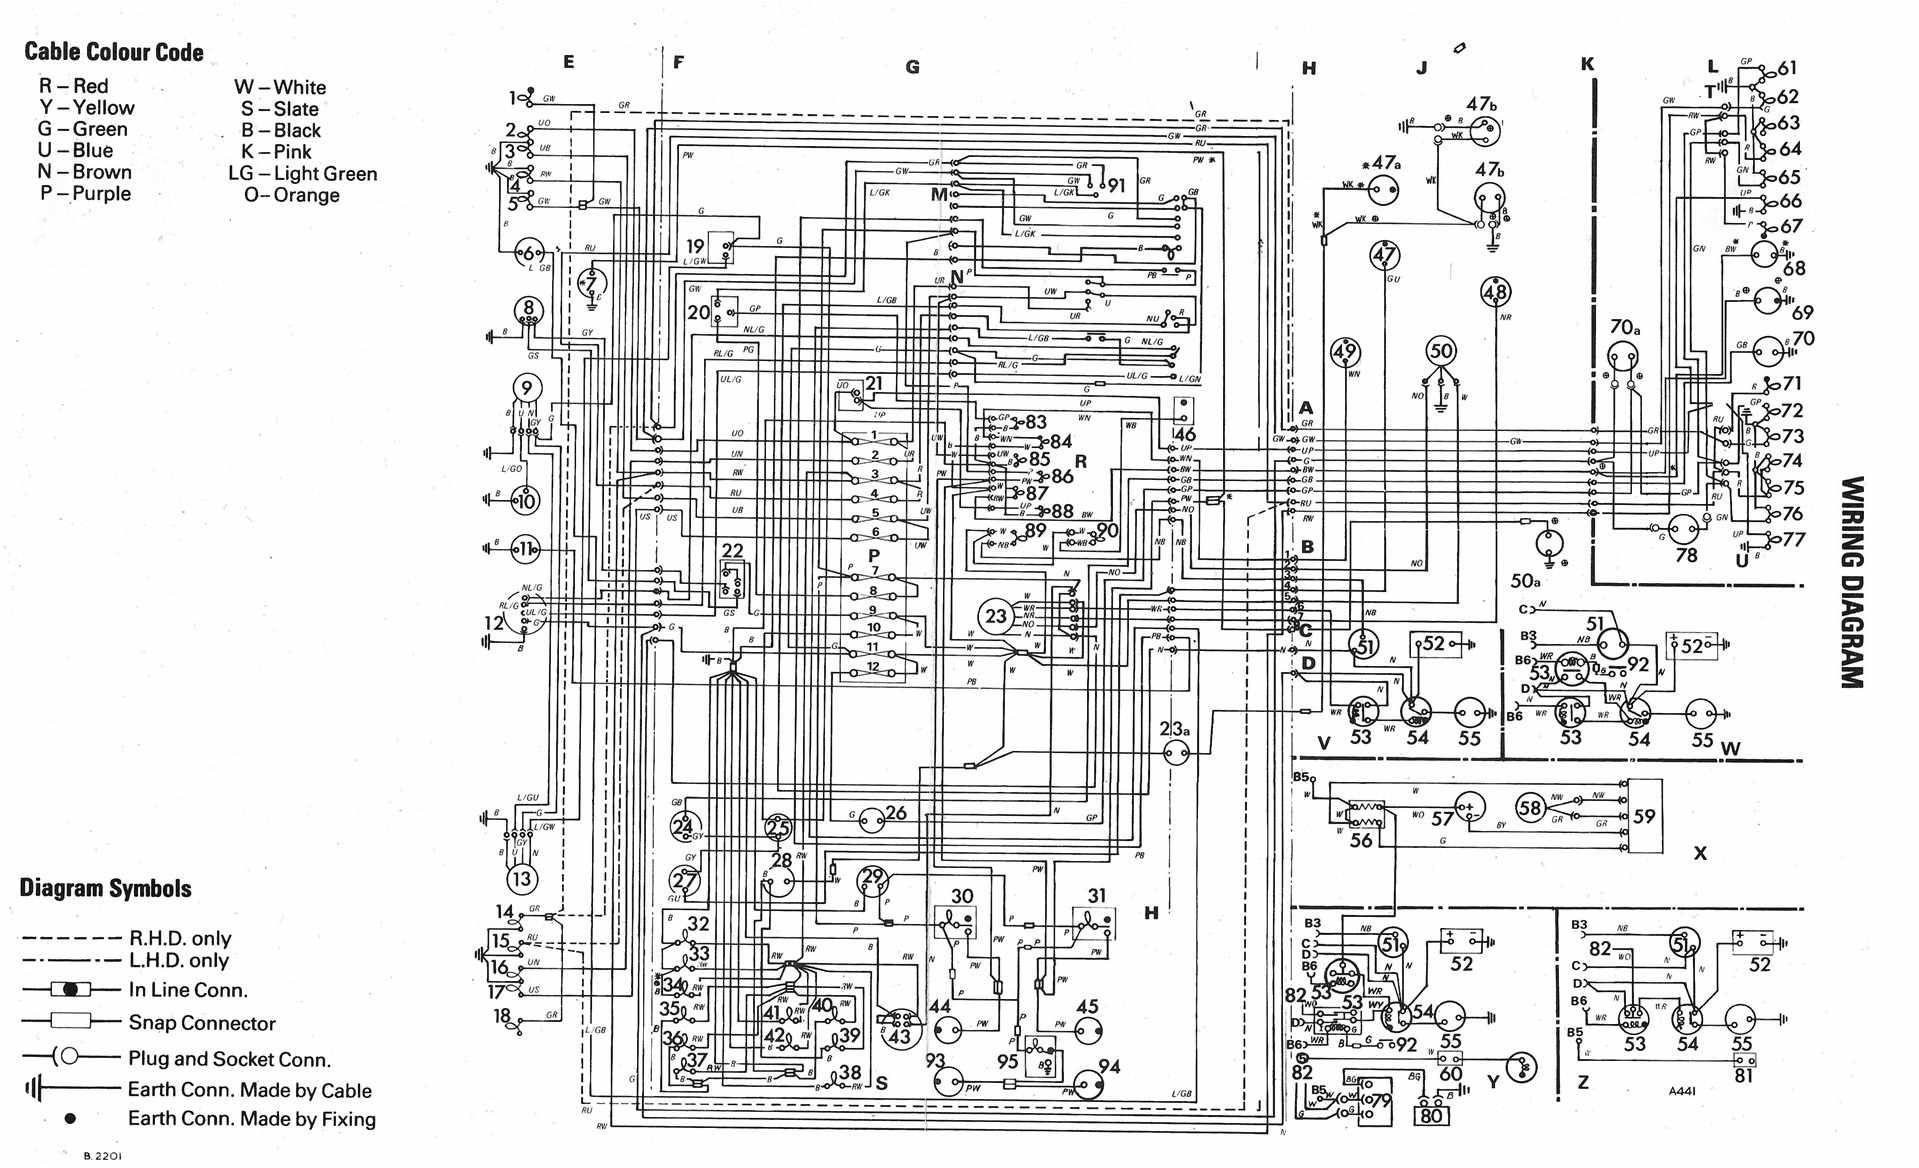 volkswagen golf audio wiring diagram room thermostat electrical of mk1 projekt